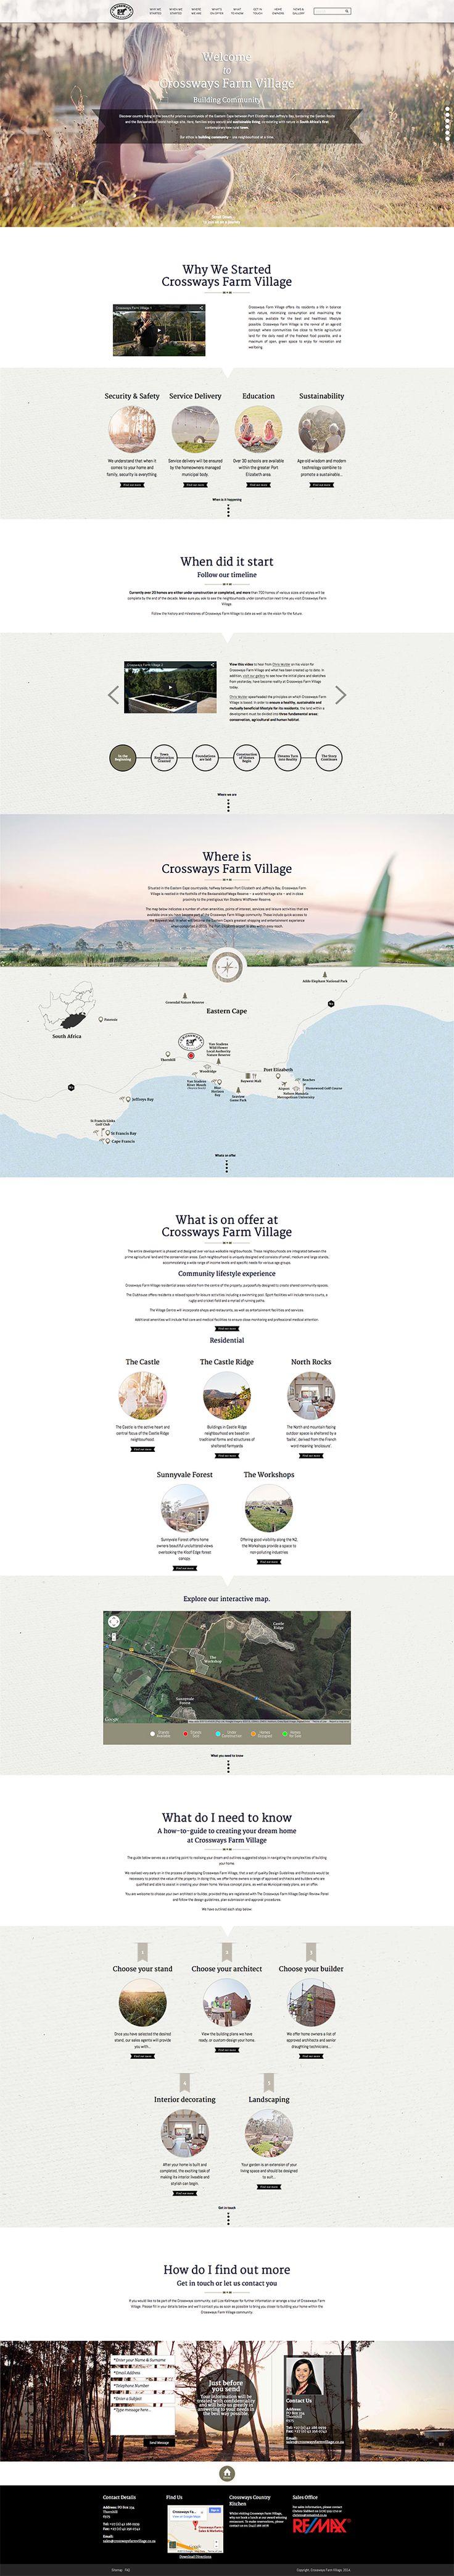 Crossways Farm Village -  Web Design, UI/UX by Louw Sevenster and Helna Brown of Boomtown Strategic Brand Agency.